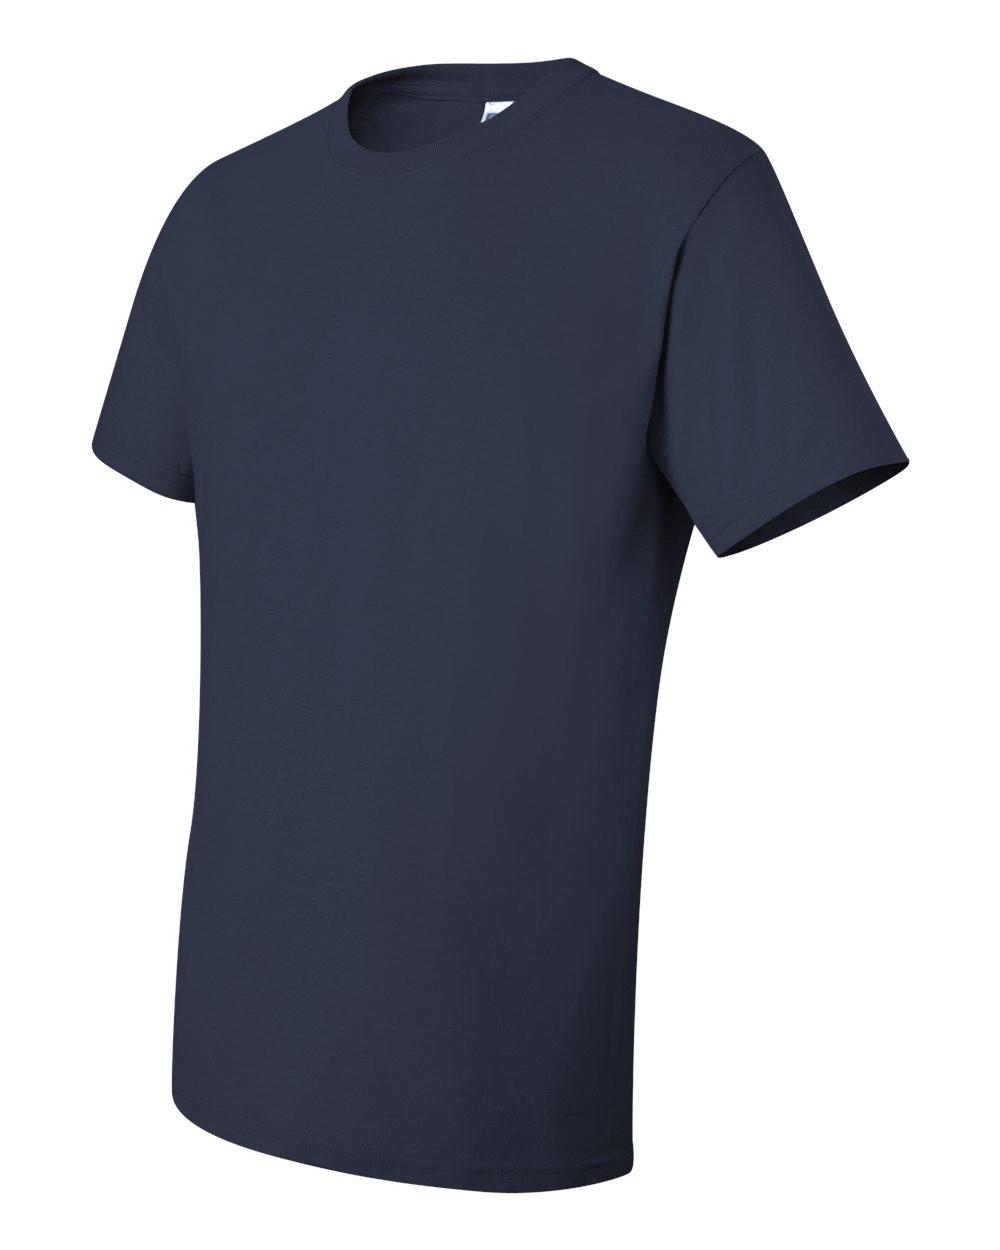 SJP Gym T-Shirt w/ Logo